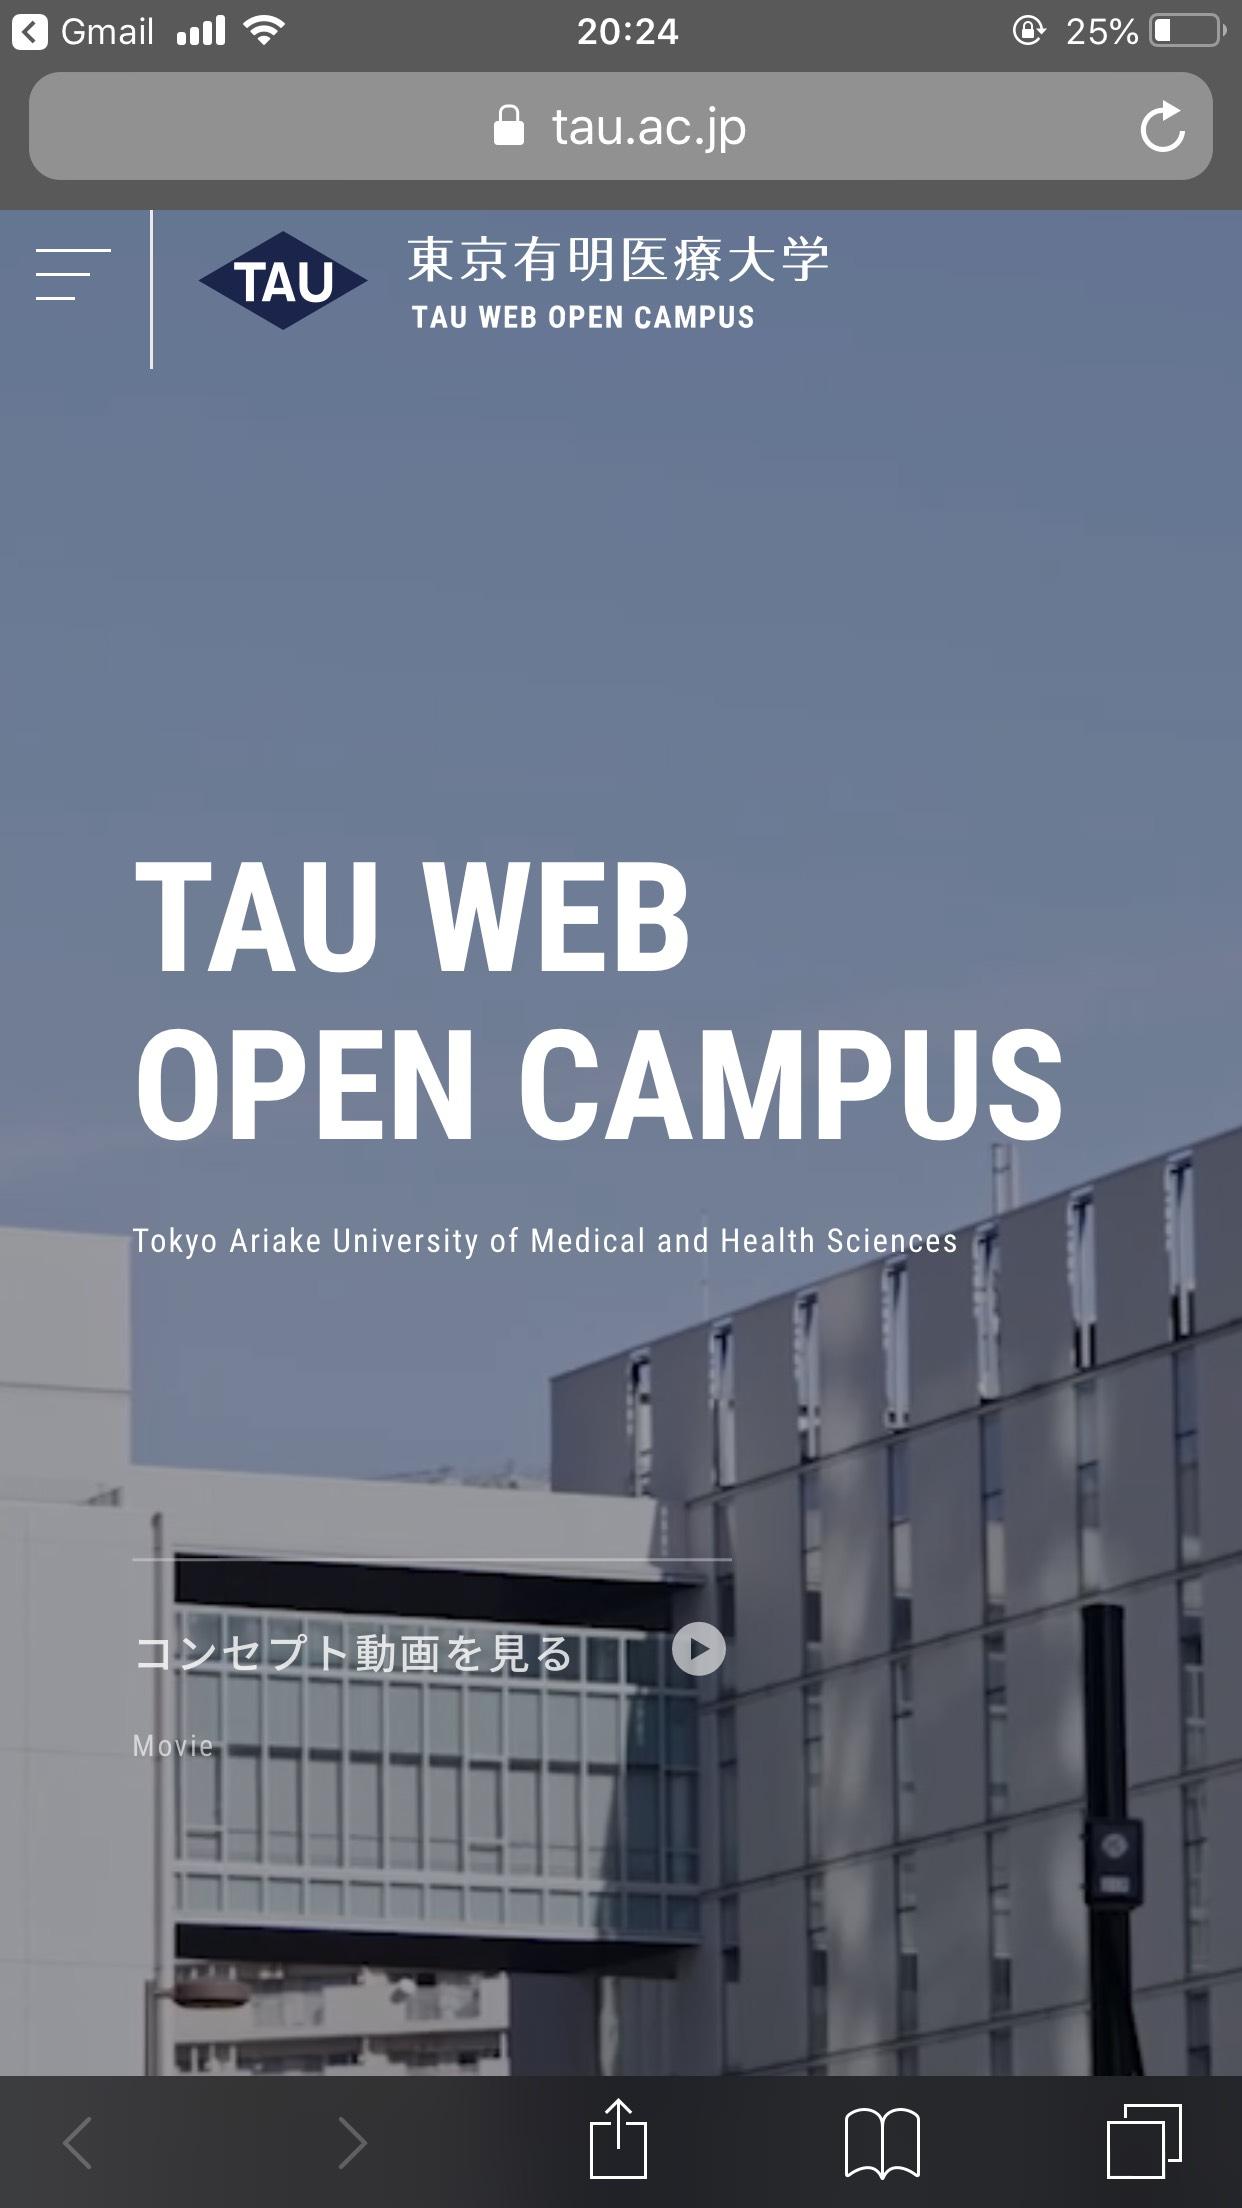 TAU WEB OPEN CAMPUS - 東京有明医療大学